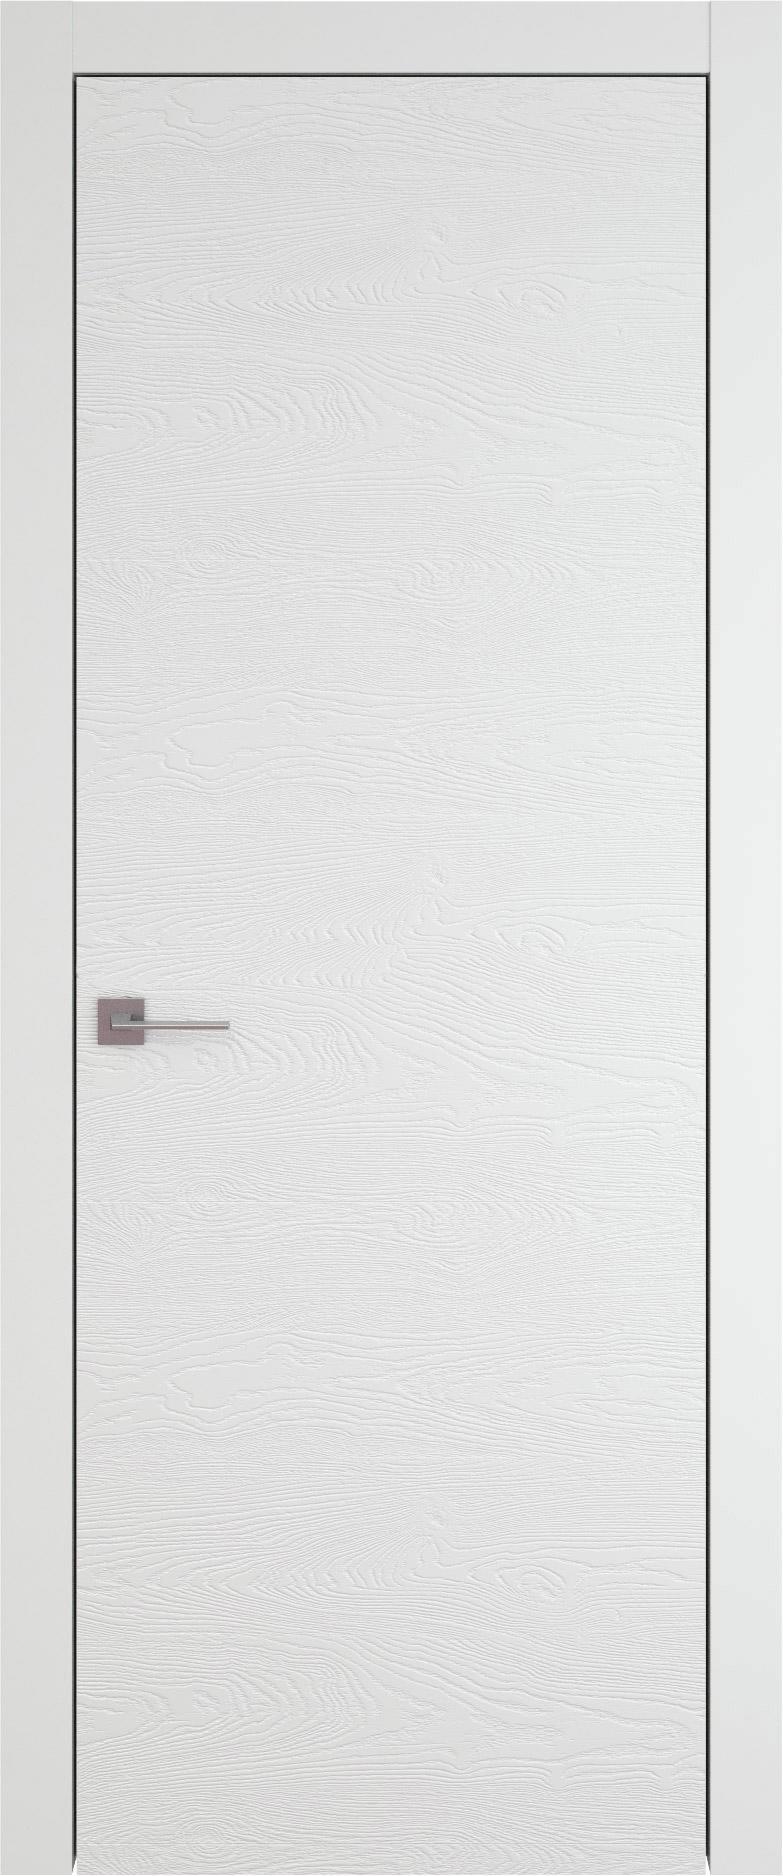 Tivoli А-2 цвет - Белая эмаль по шпону (RAL 9003) Без стекла (ДГ)